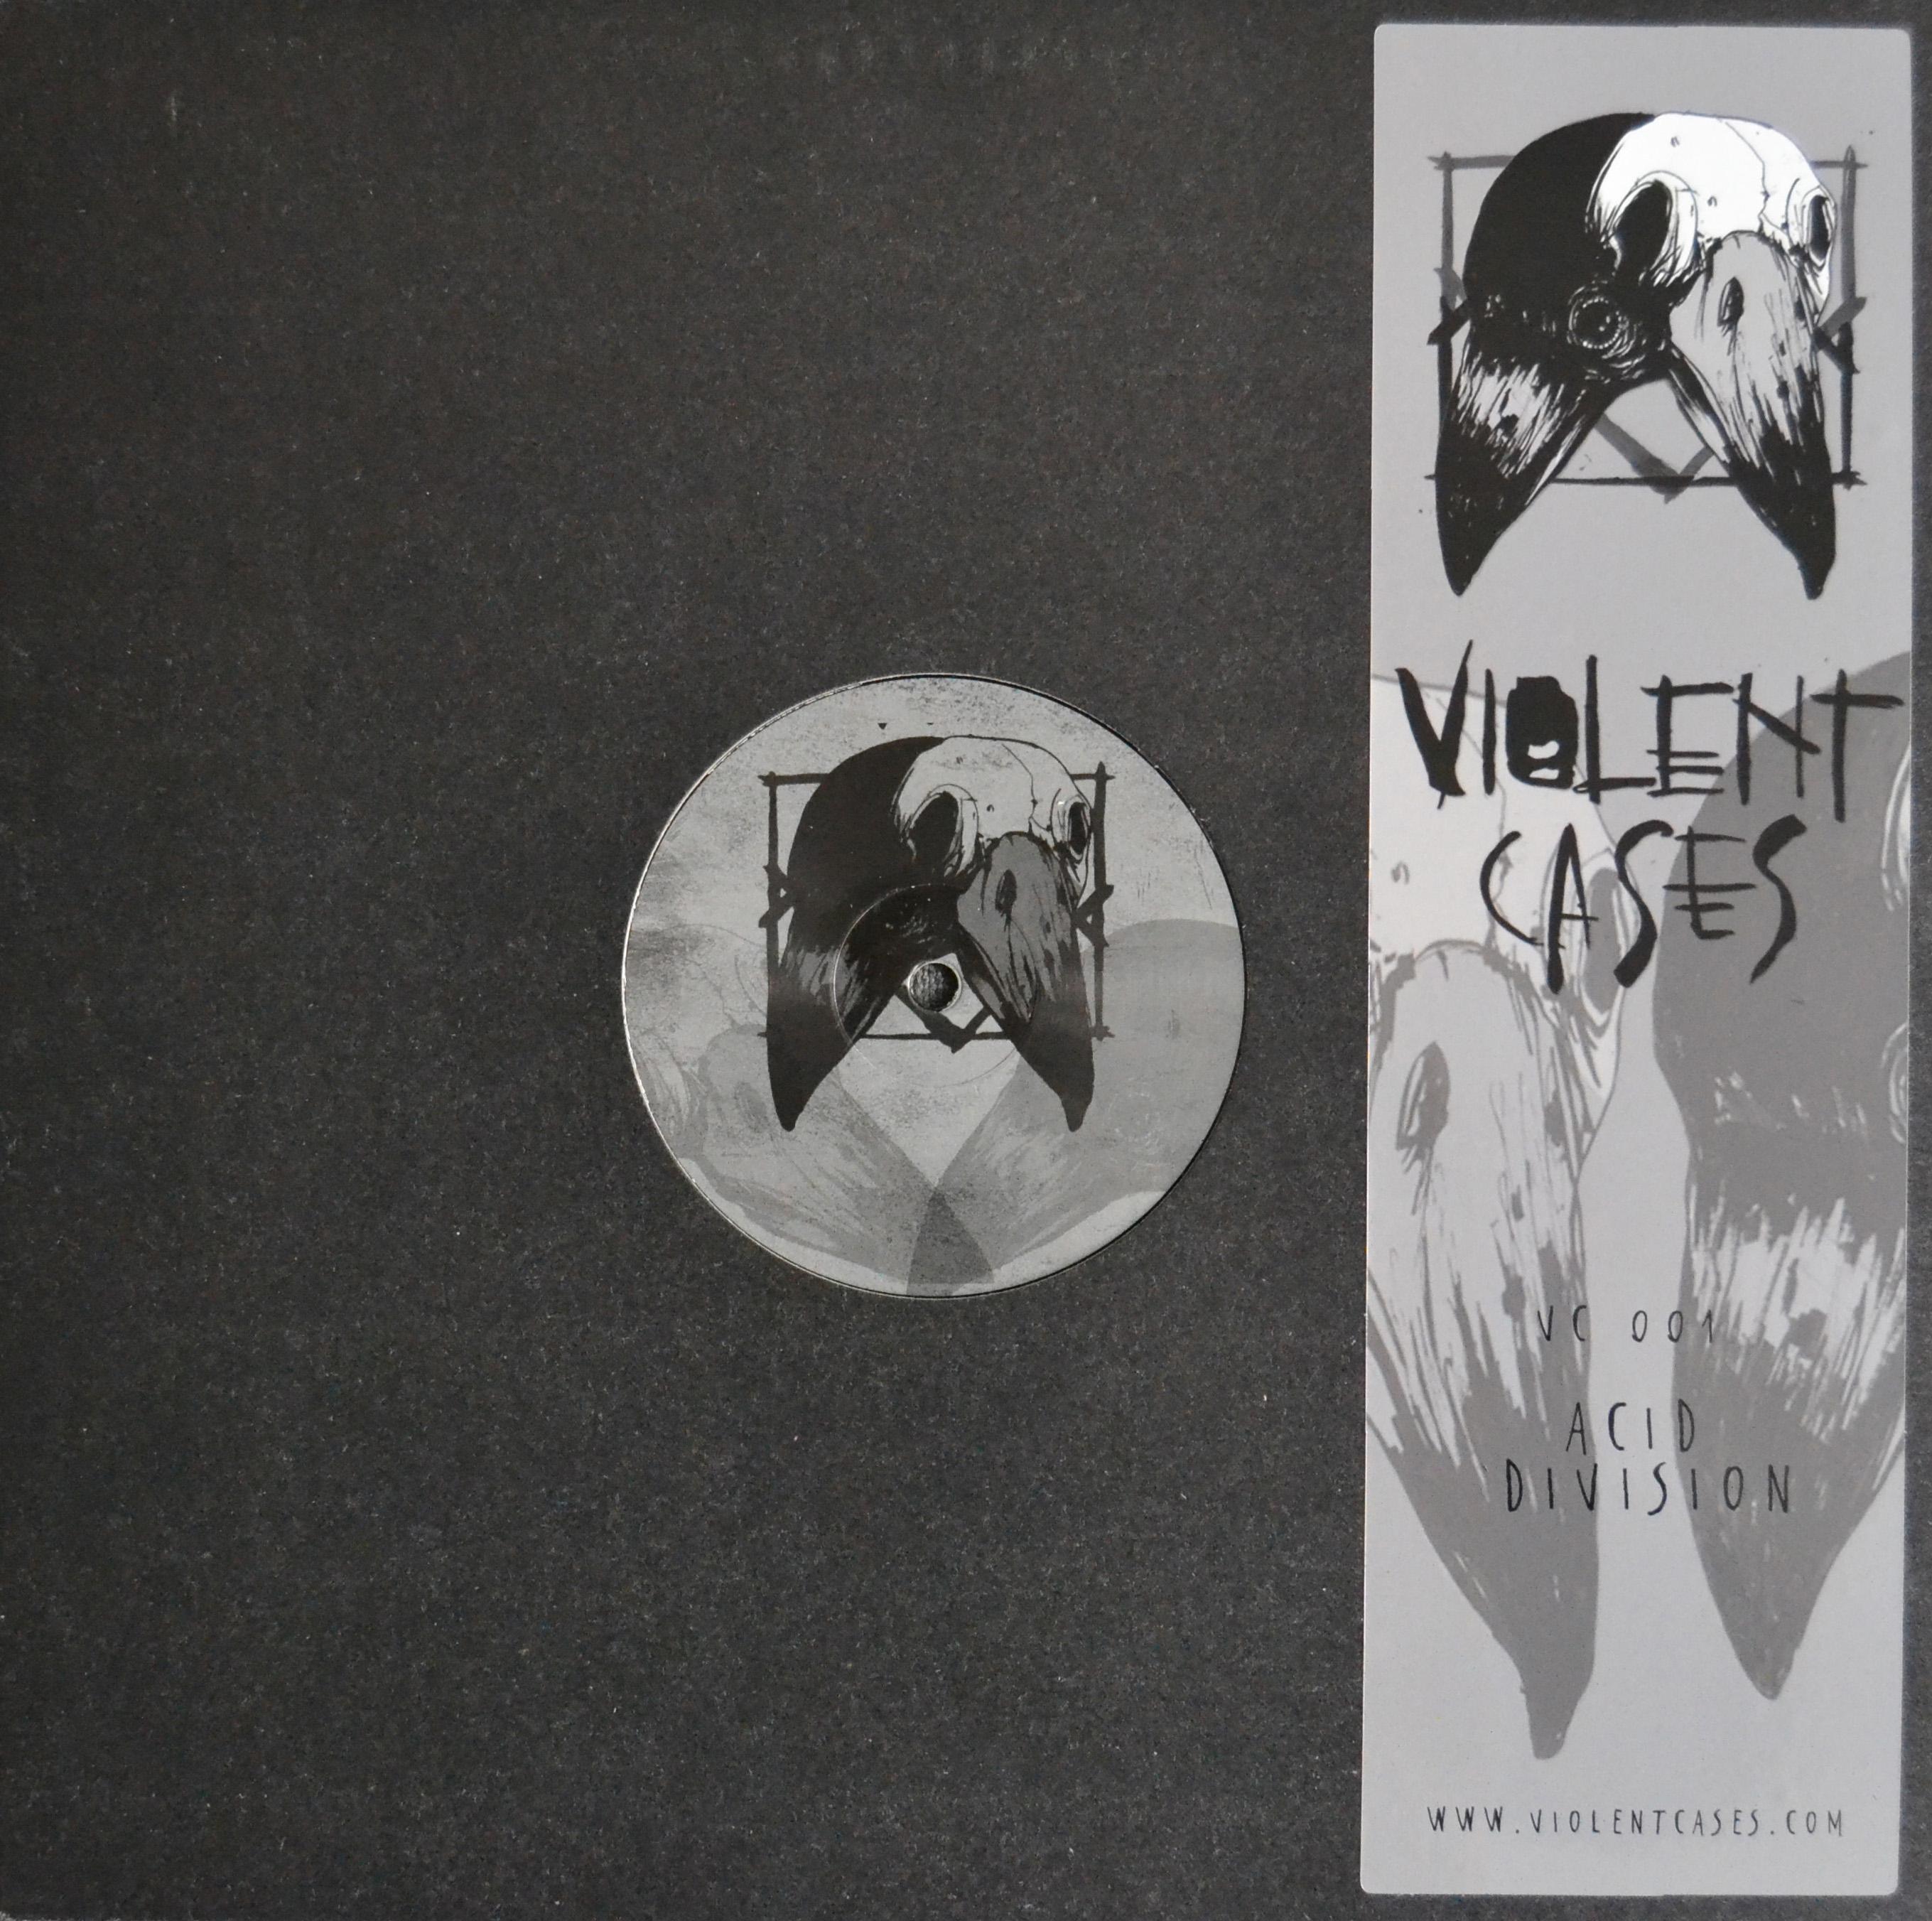 Violent Cases 001